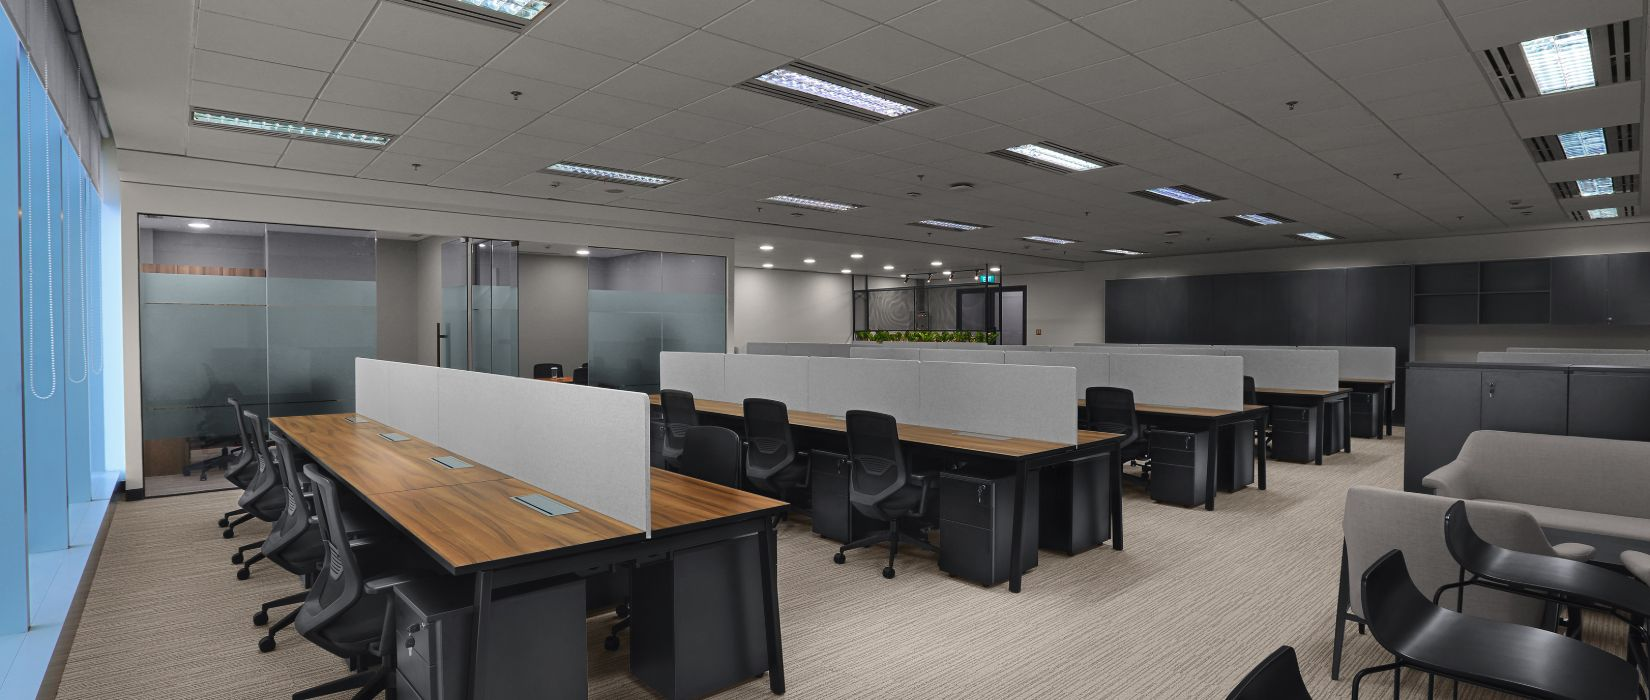 08. Office_Suite_1_Capacity